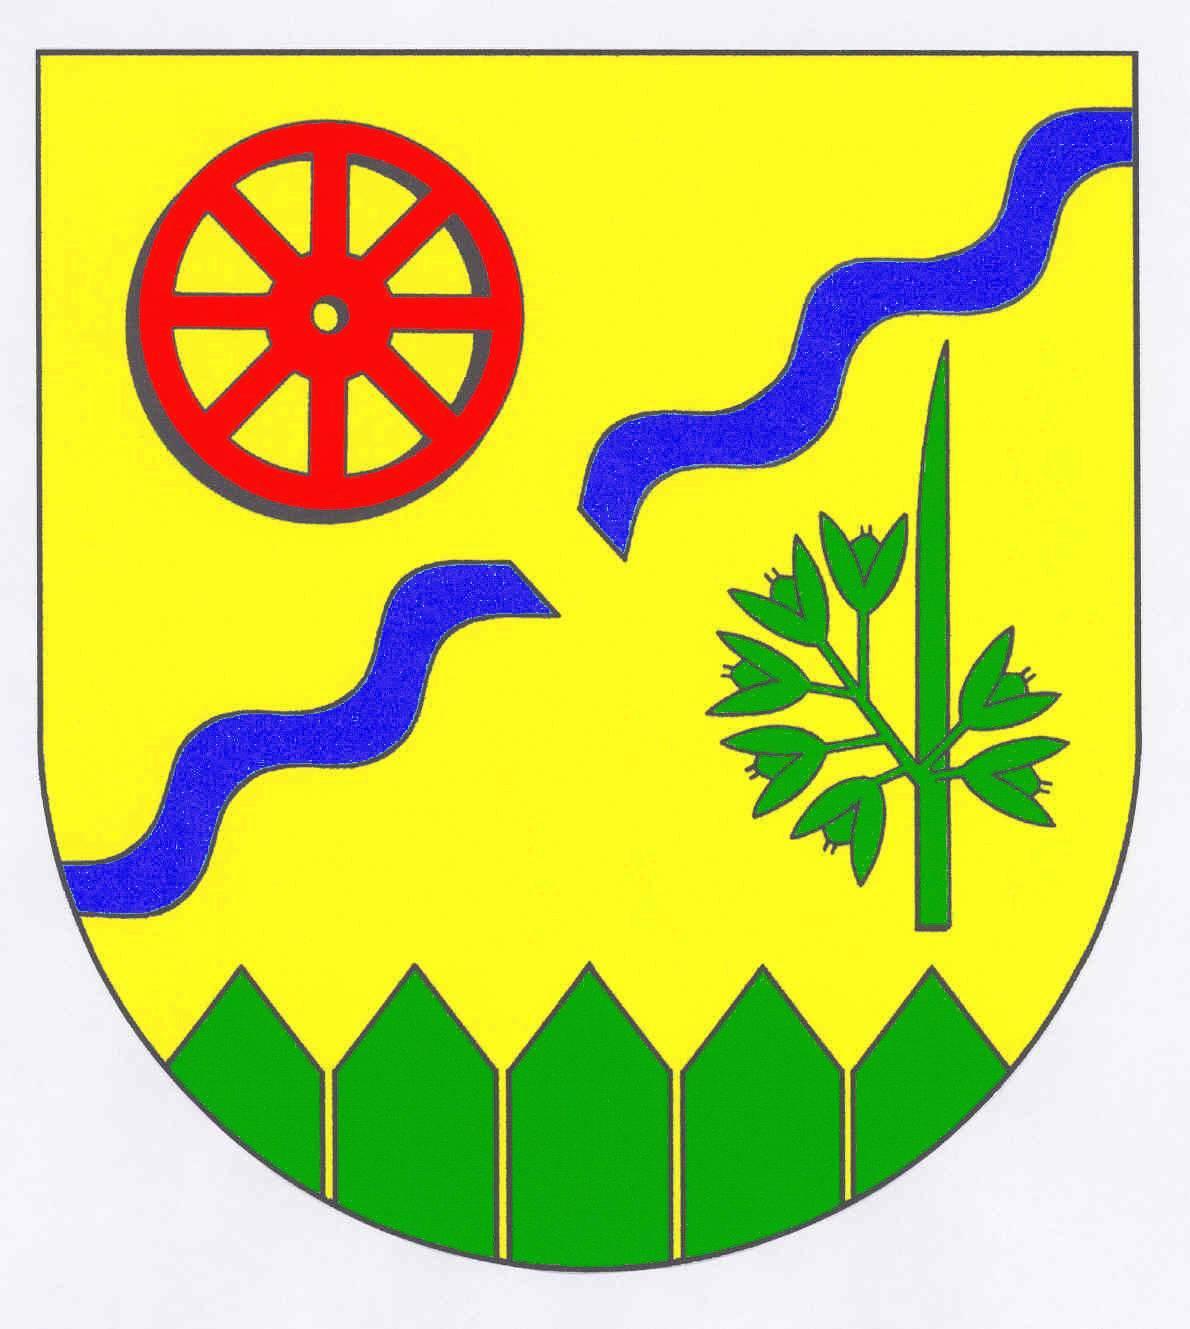 Wappen GemeindeWapelfeld, Kreis Rendsburg-Eckernförde